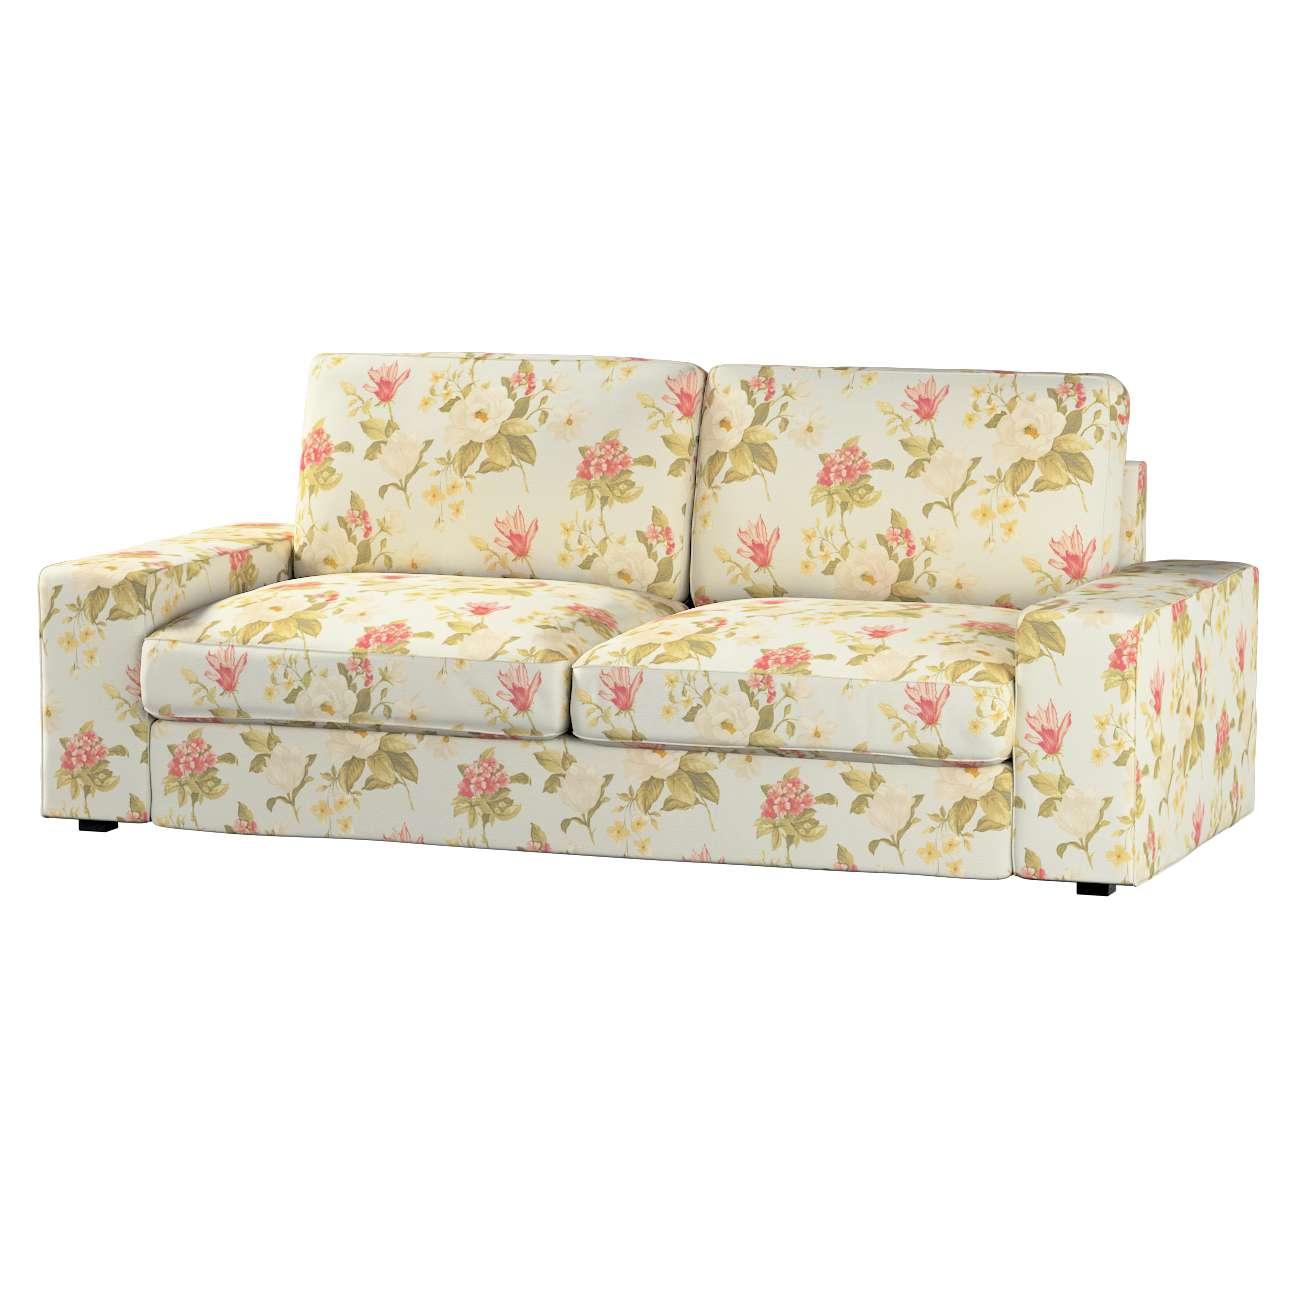 Kivik 3-Sitzer Sofabezug Sofa Kivik 3-Sitzer von der Kollektion Londres, Stoff: 123-65